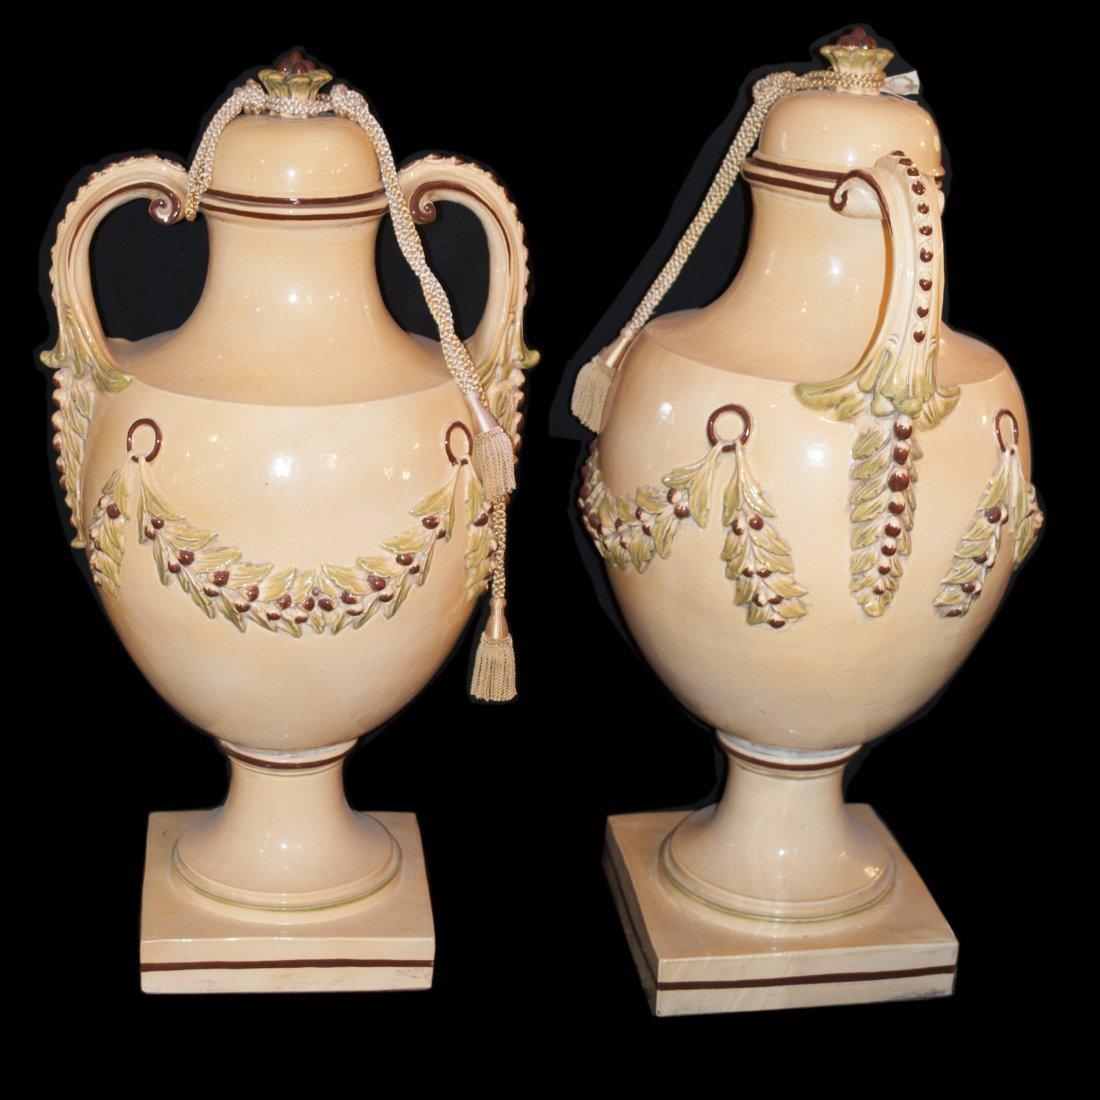 Large Majolica Ceramic Urns